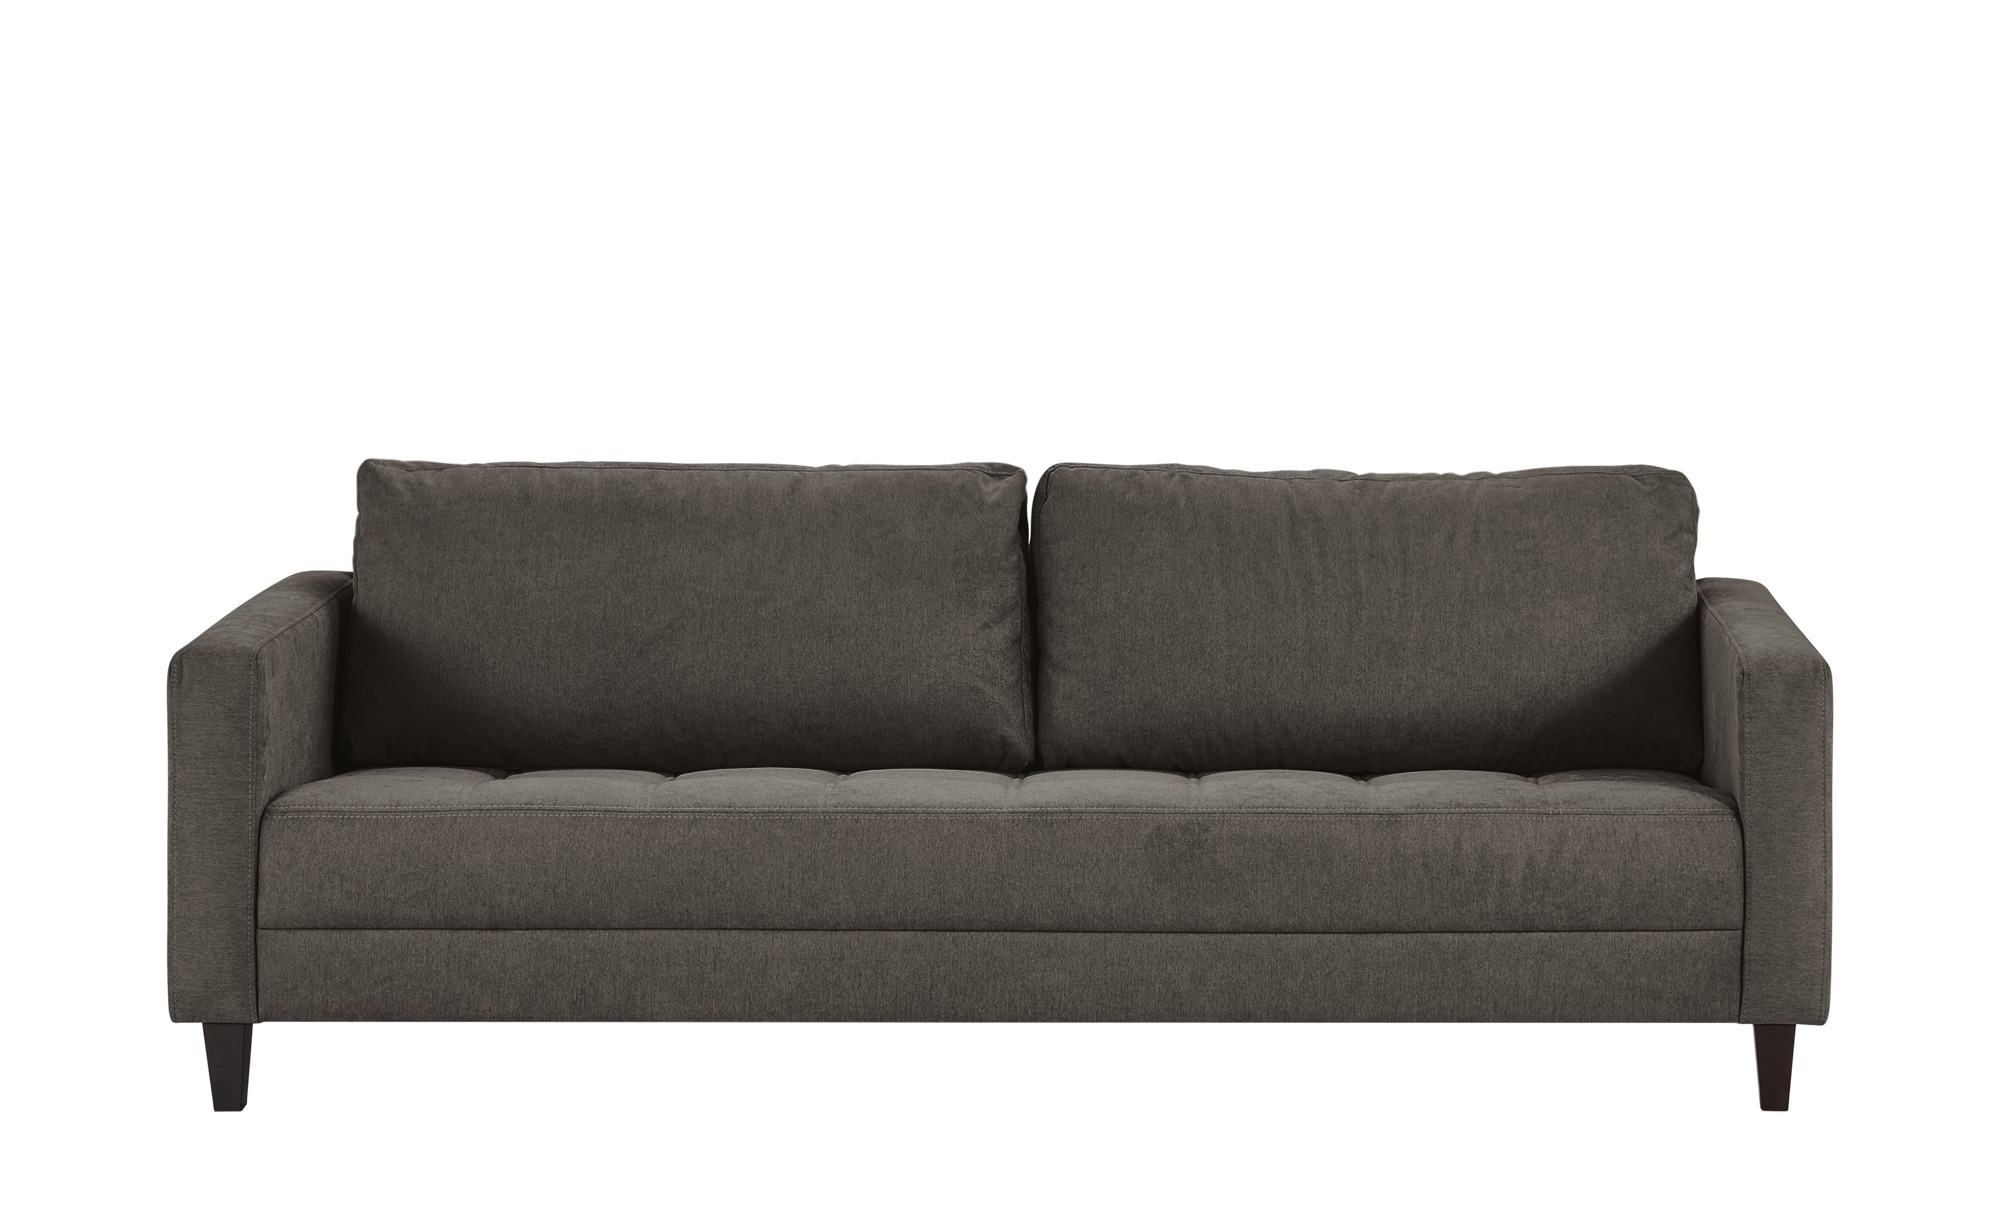 smart Sofa grau - Flachgewebe Geradine ¦ grau ¦ Maße (cm): B: 226 H: 93 T: 92 Polstermöbel > Sofas > 3-Sitzer - Höffner